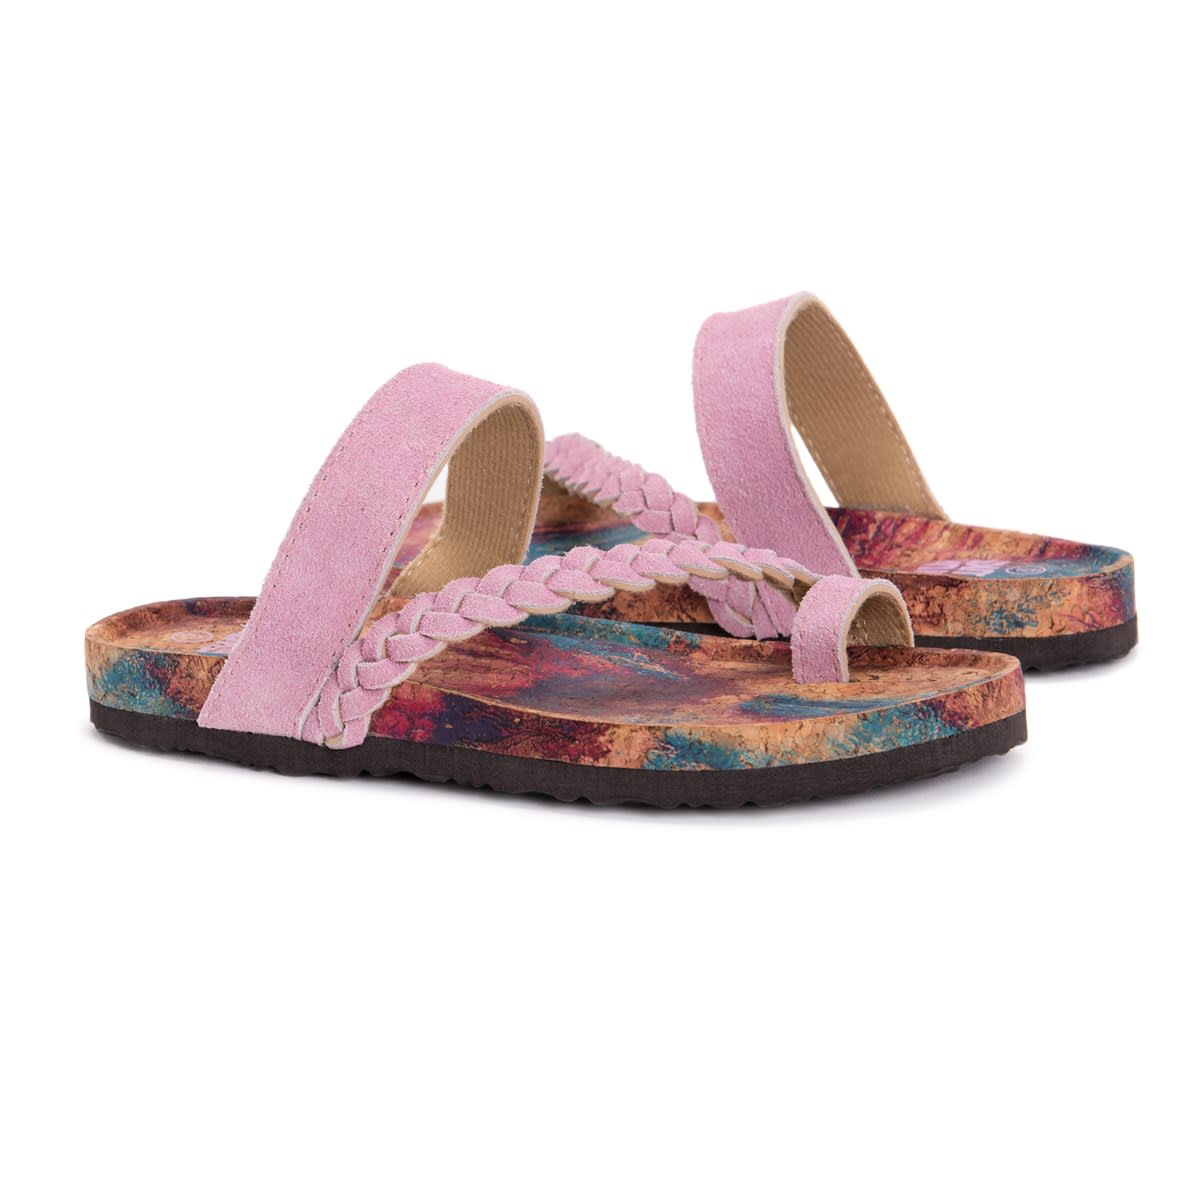 MUK LUKS® Women's Keia Sandals